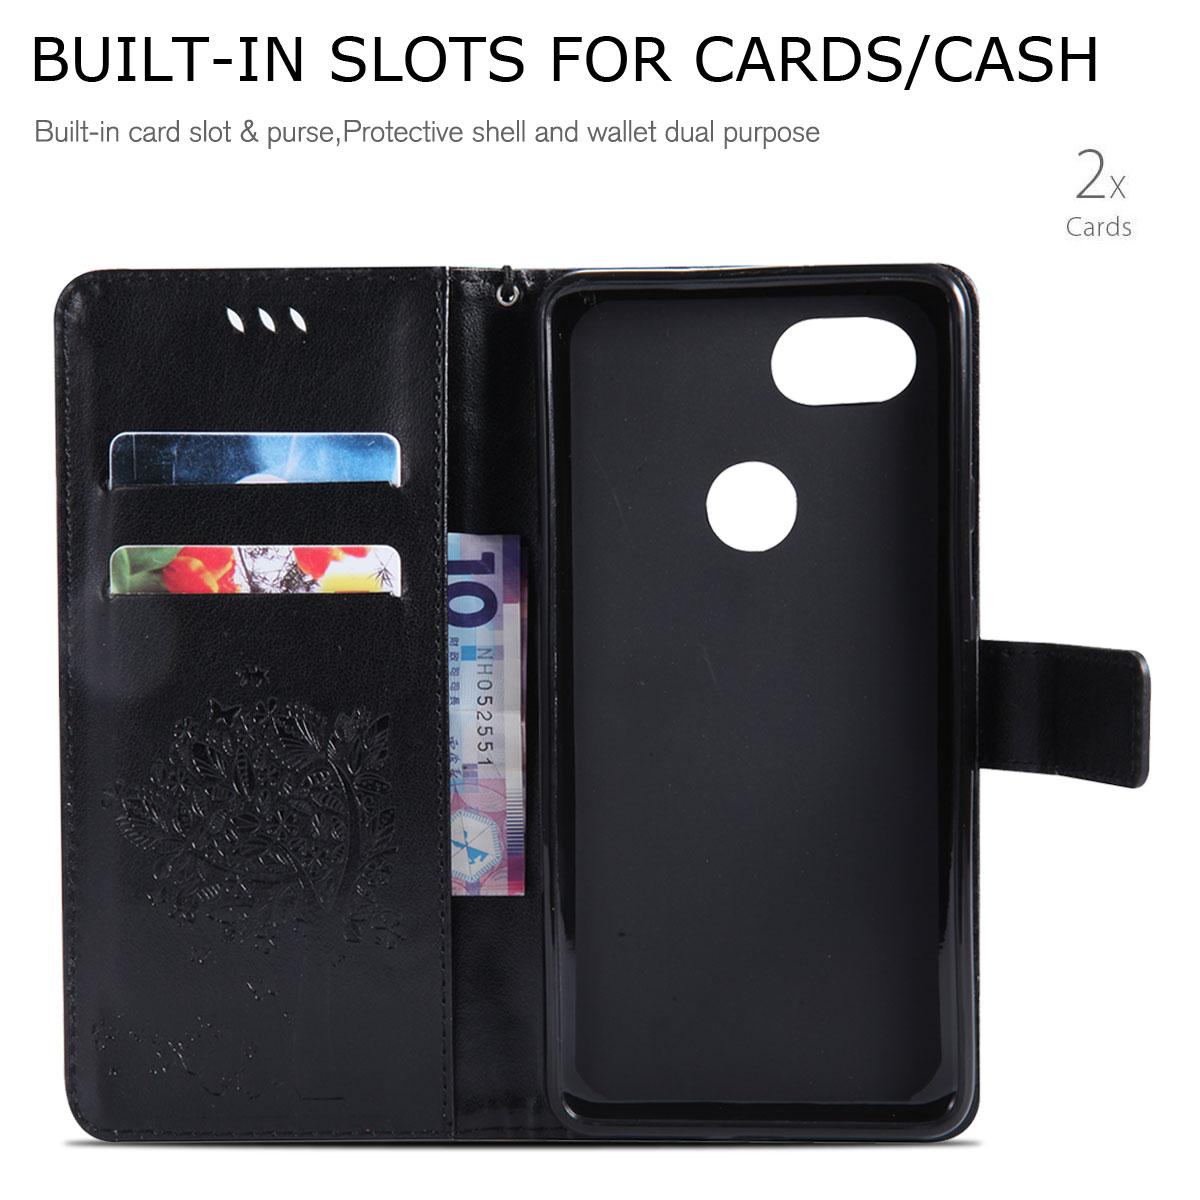 Magnetic-Leather-Credit-Card-Holder-Flip-Case-Cover-For-Google-Pixel-2-2-XL thumbnail 55